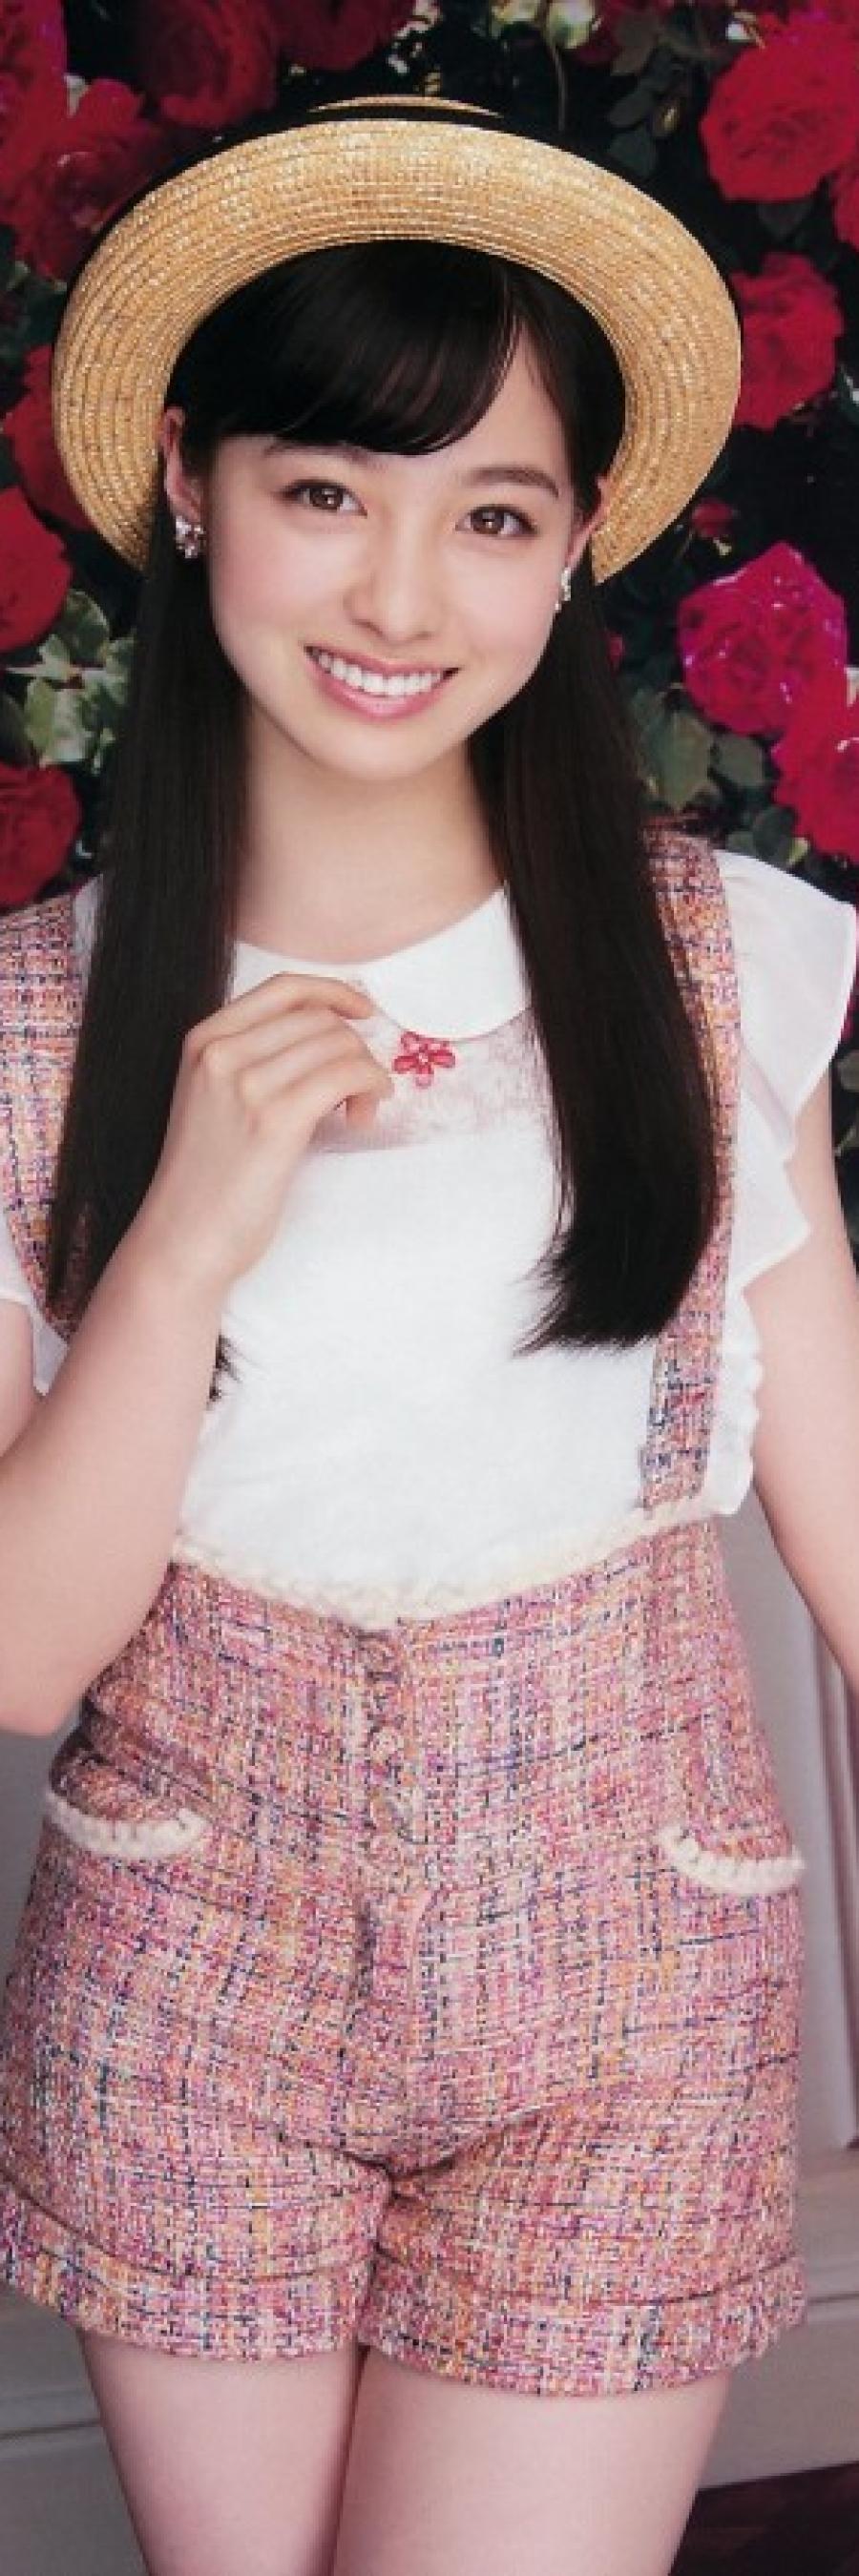 Nozomi kurahashi japanese teen model, xxx ladies orgies